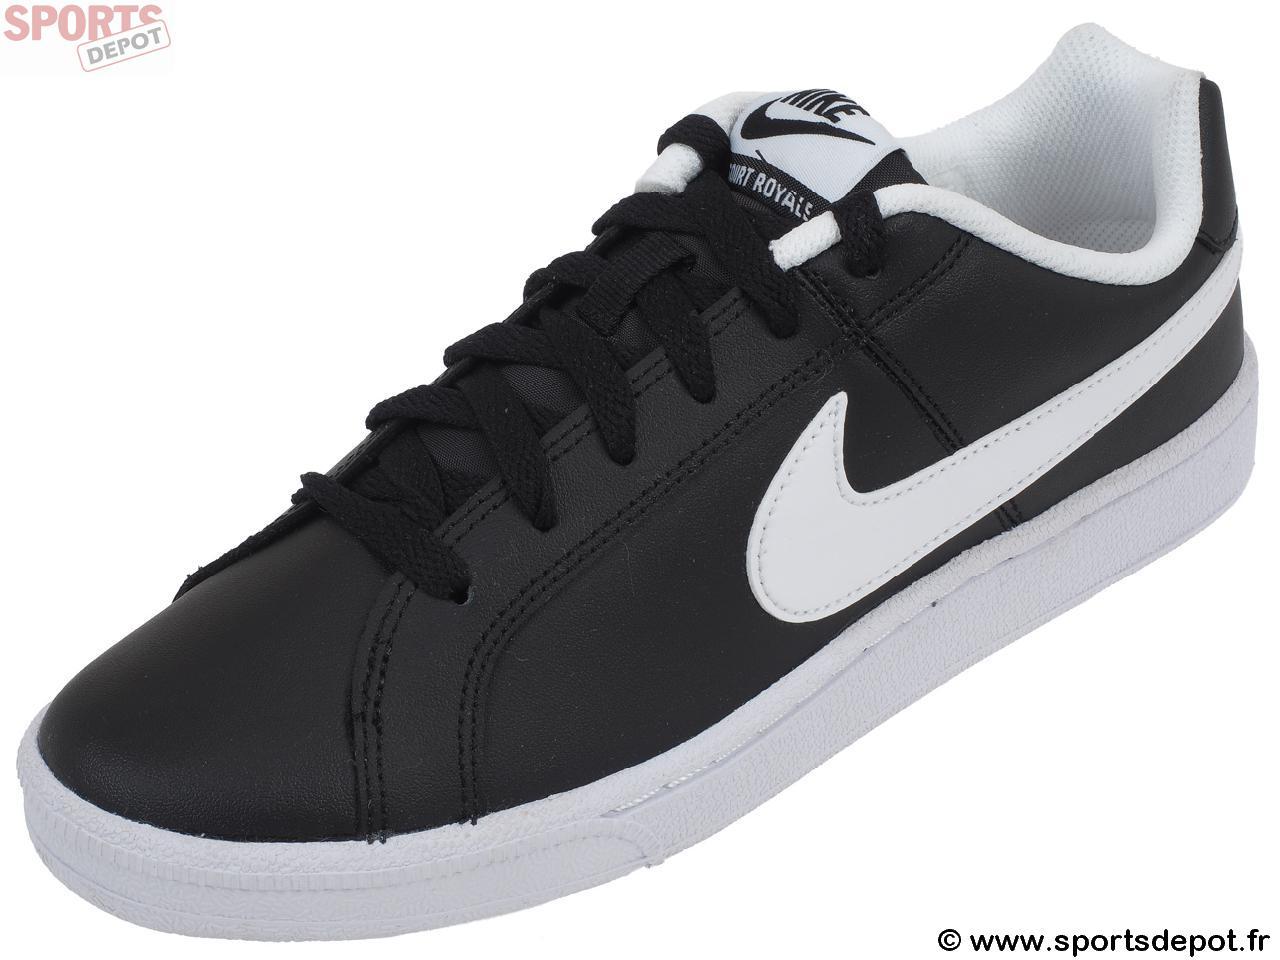 Ou Street Chaussures Cuir Court Simili Basses Royale Acheter Nike ZHxqwR04Z